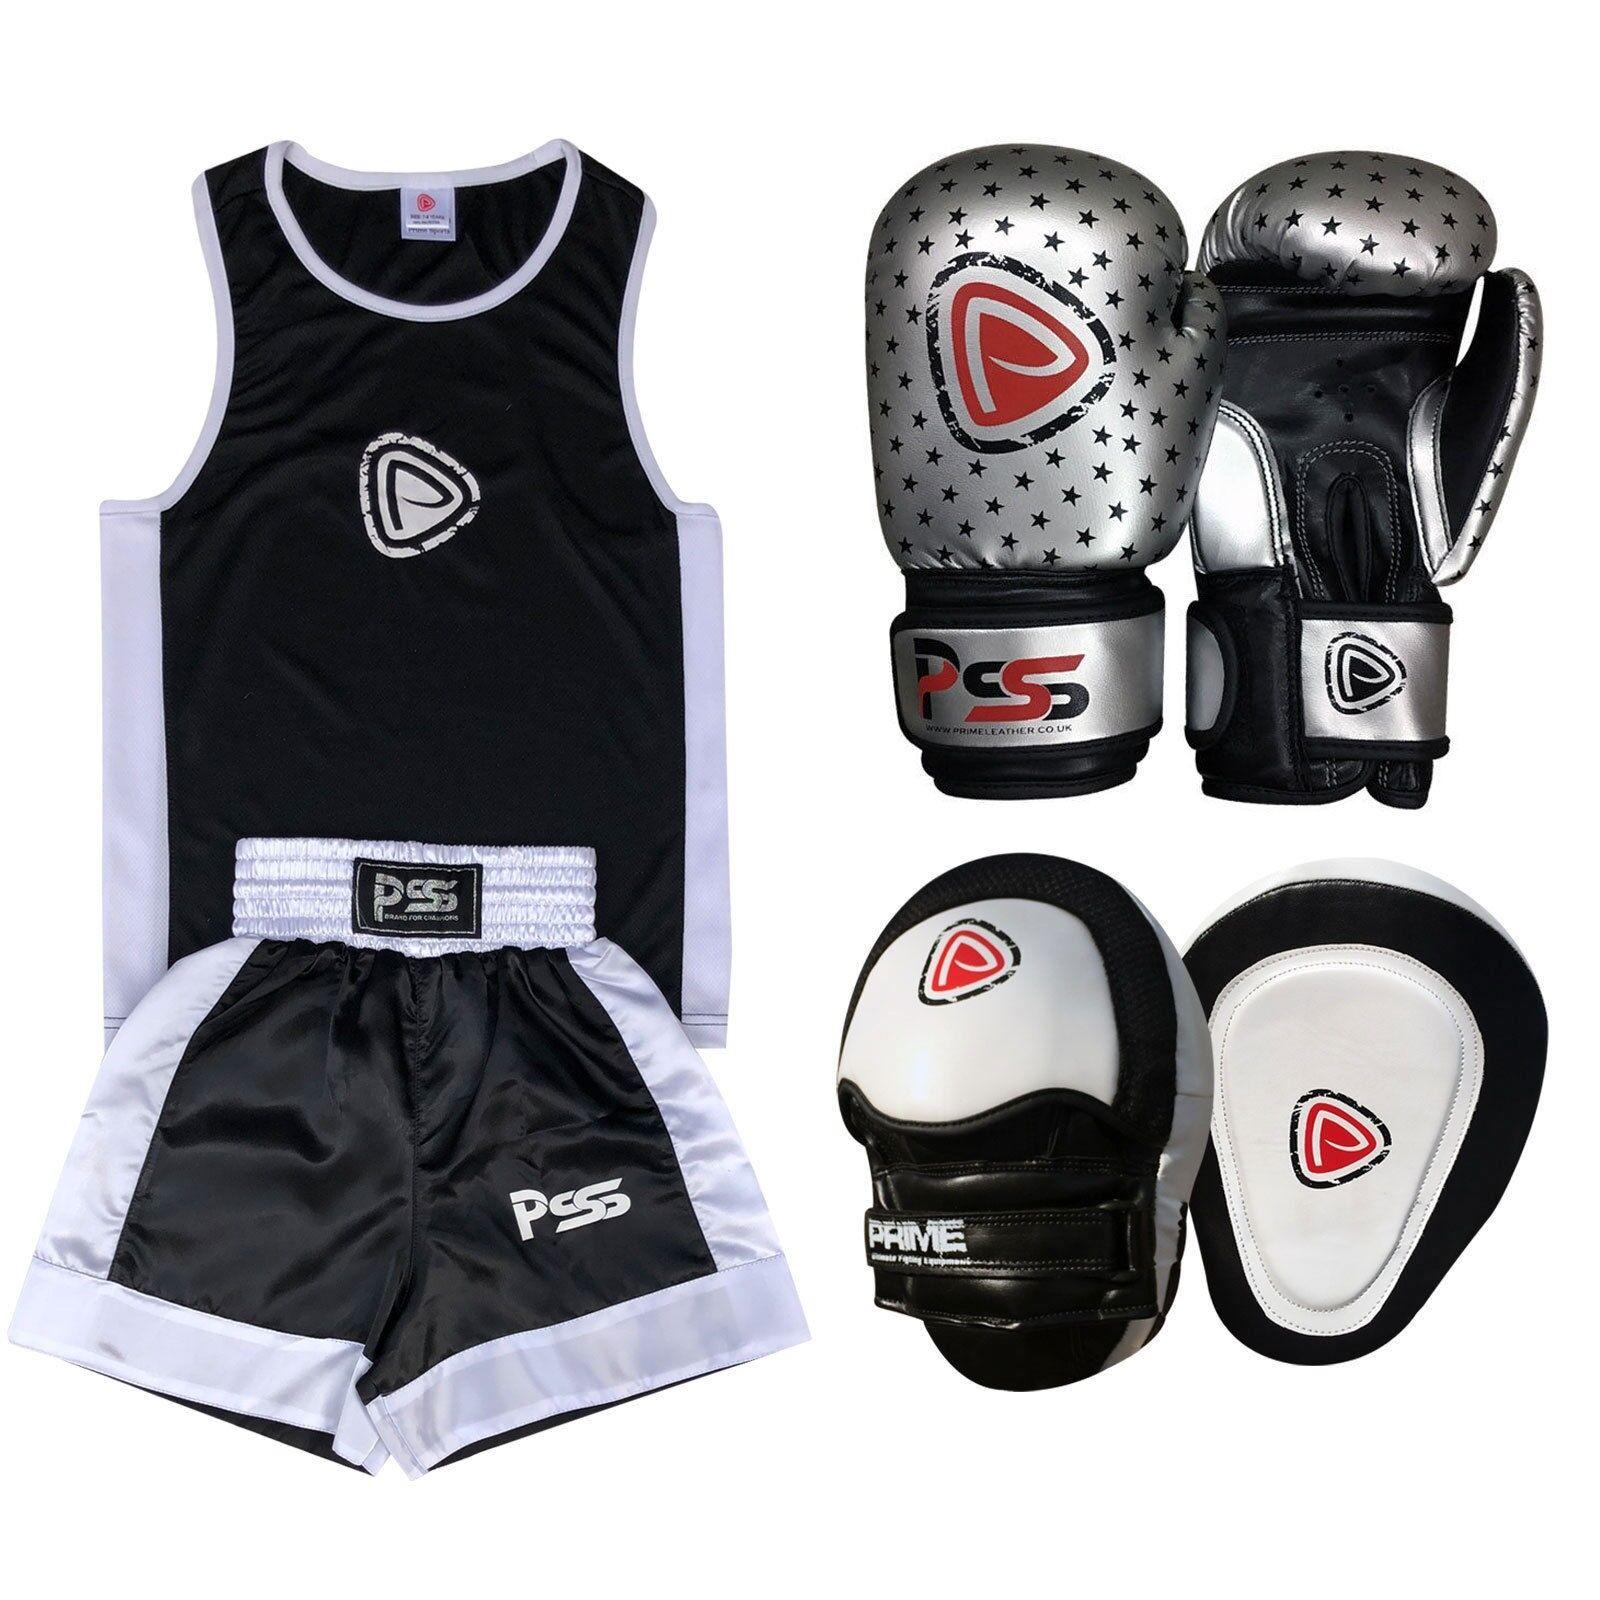 Kids boxing SET 3 Pcs Uniform Boxhands 1010 Focus pad 1104 (SET-17)